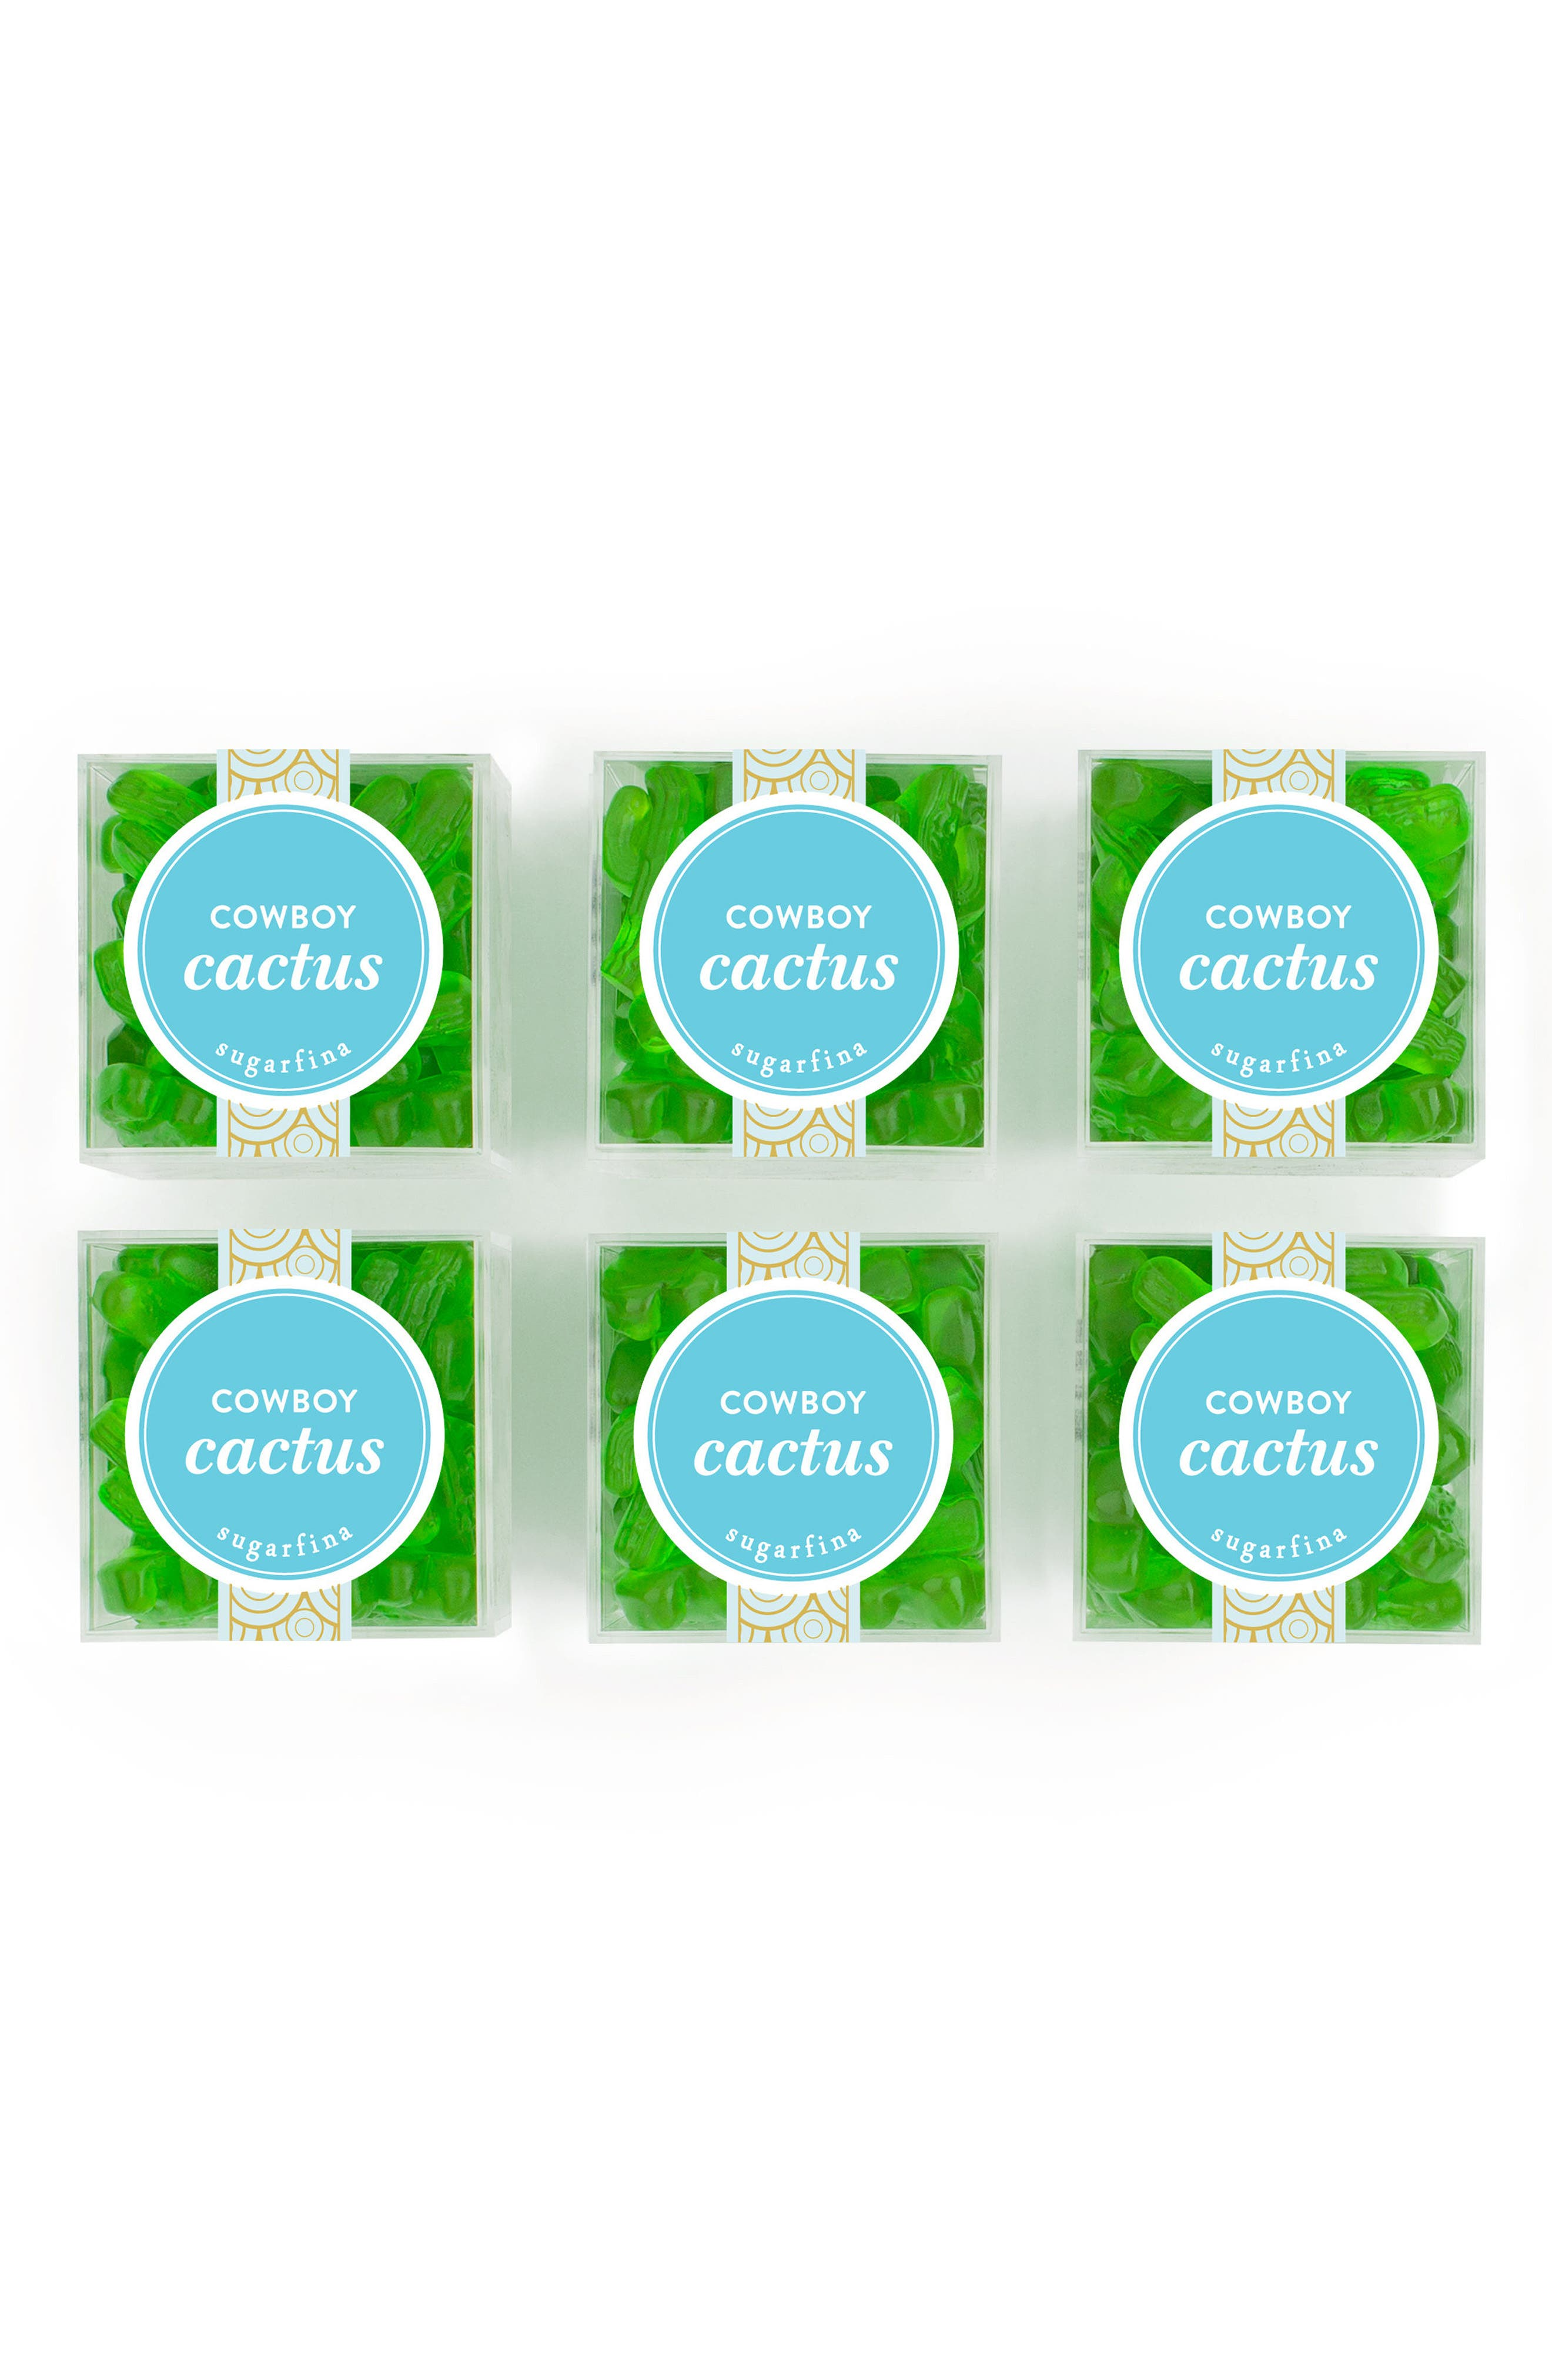 Cowboy Cactus Set of 6 Candy Cubes,                             Main thumbnail 1, color,                             Green